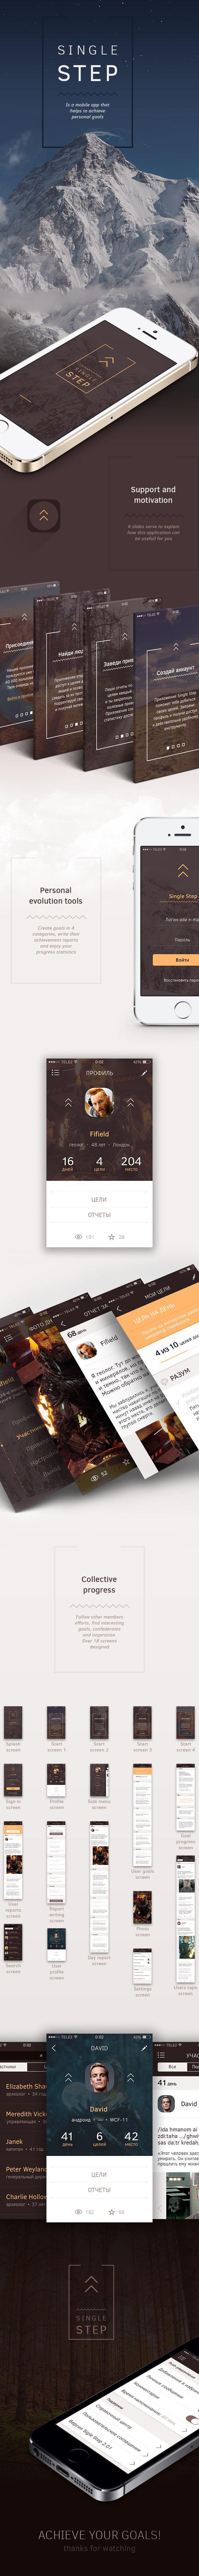 Single Step app by Pavel Sikorsky